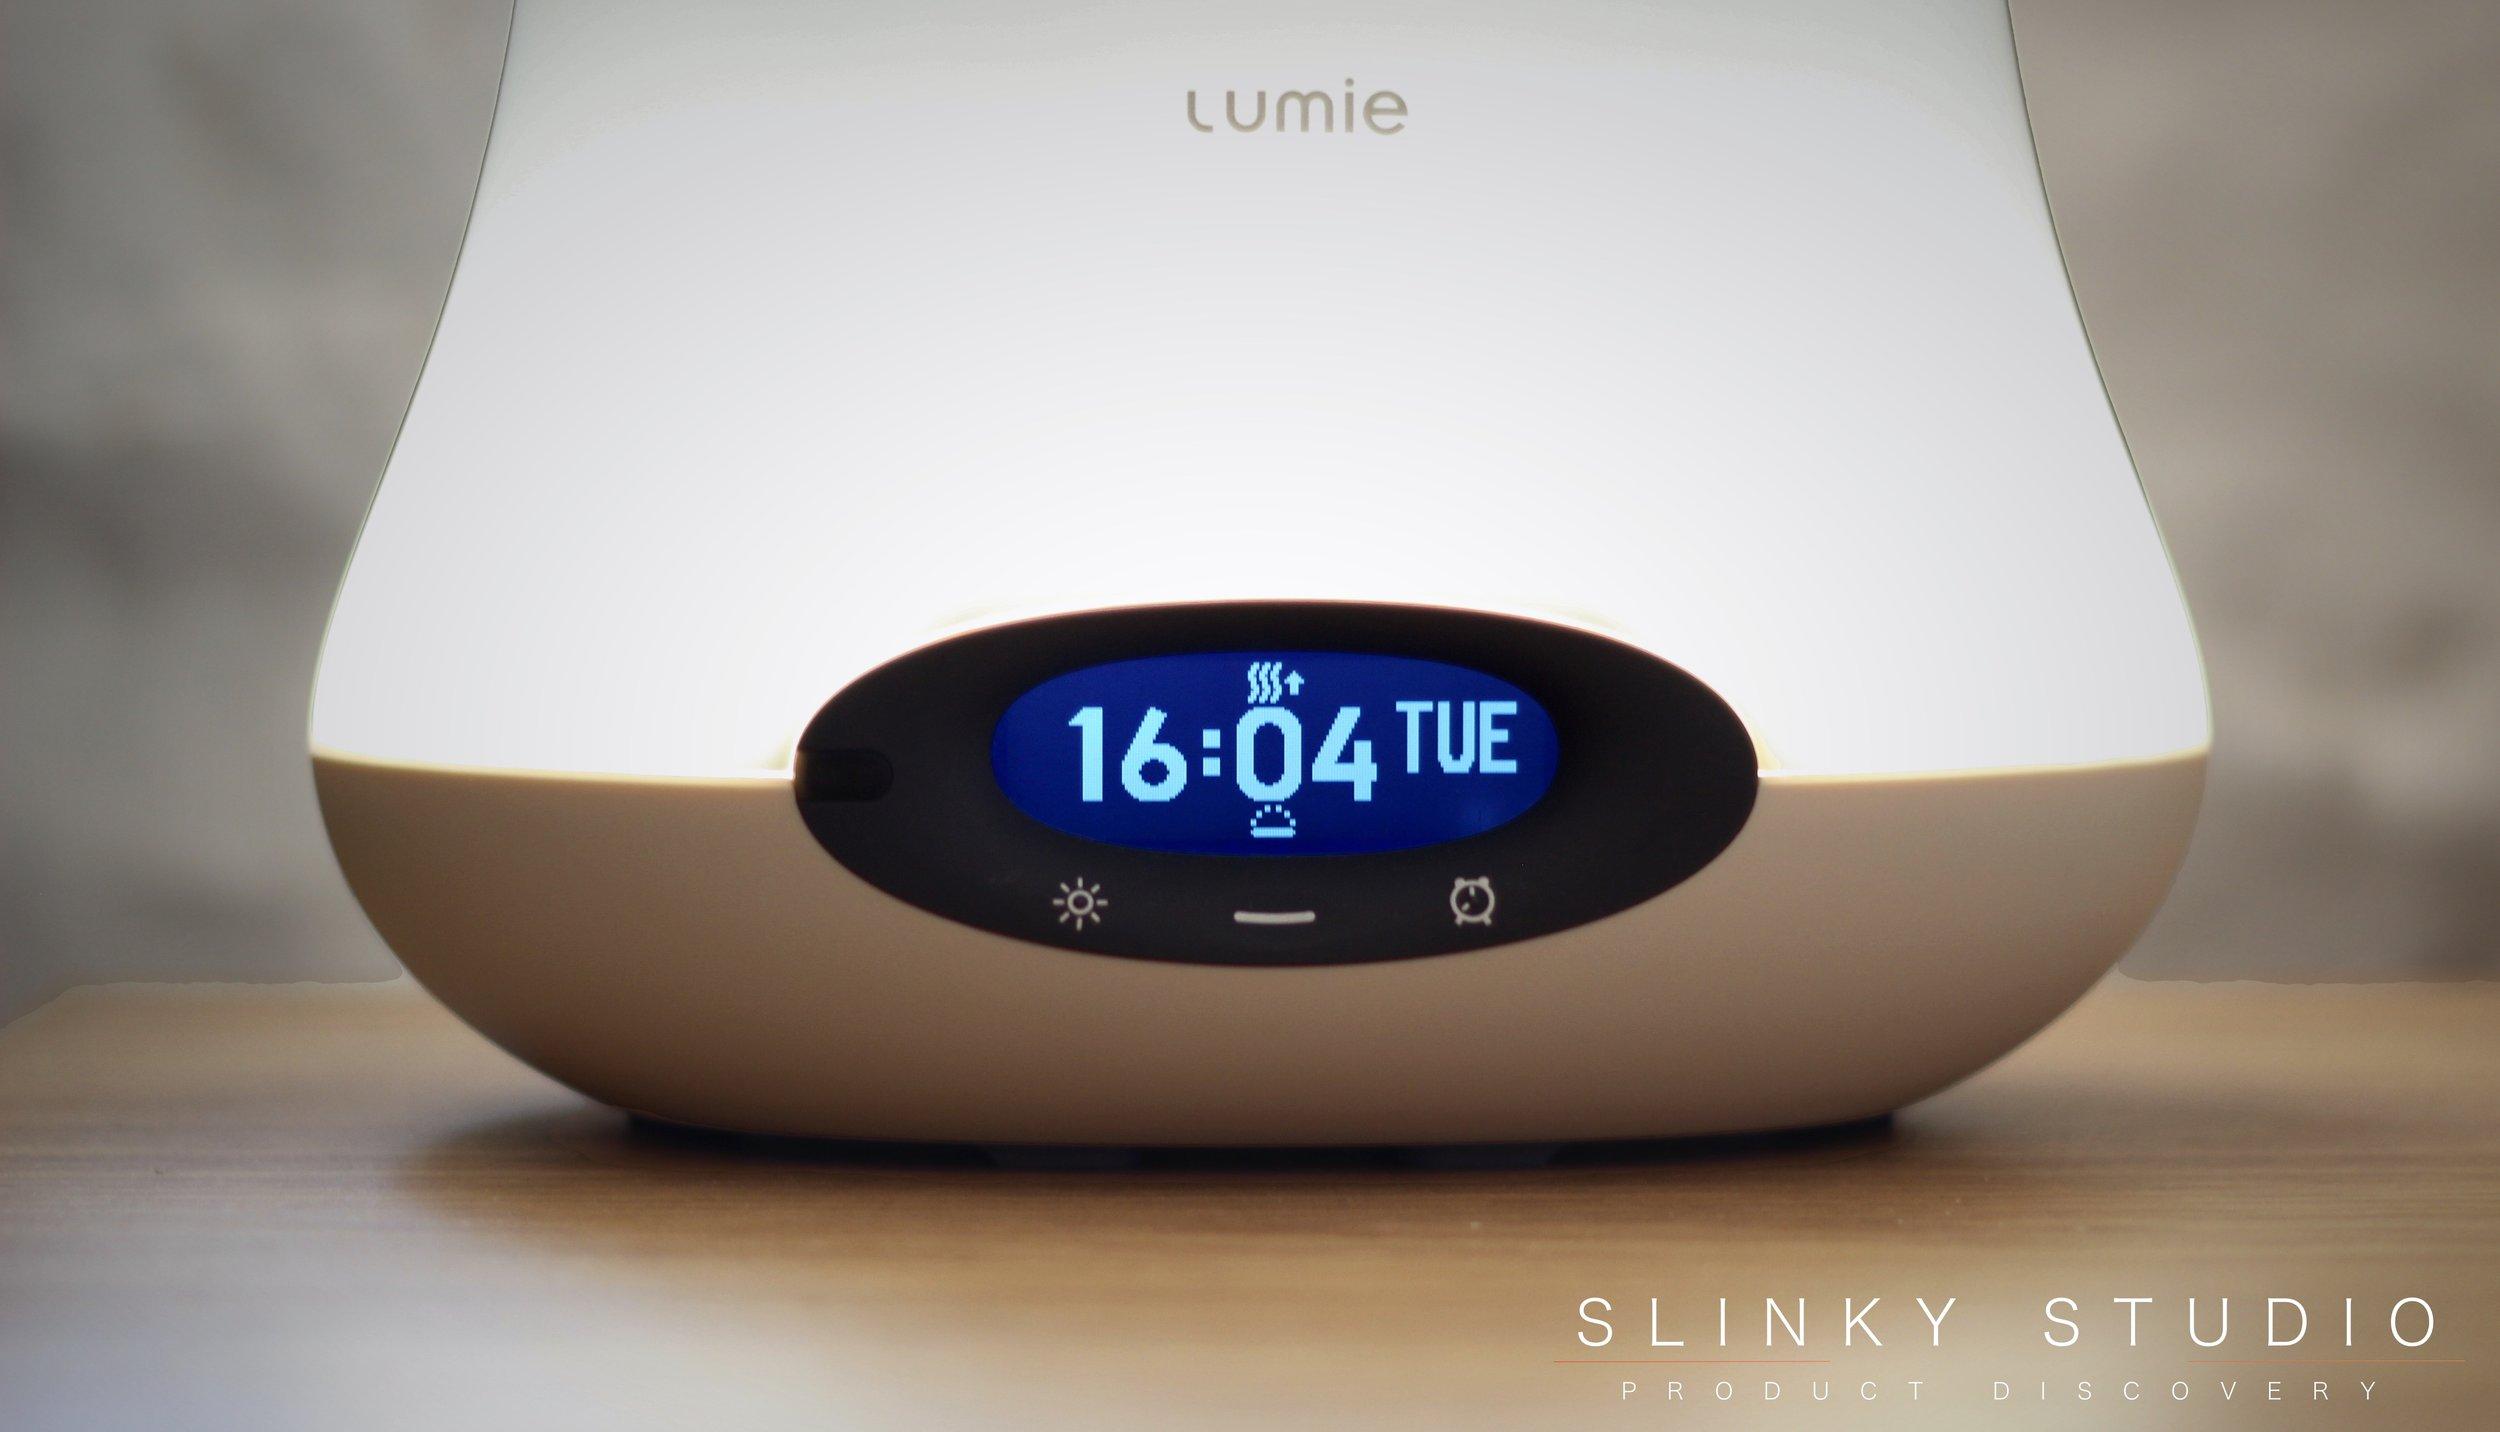 Lumie Bodyclock IRIS 500 Screen & Controls.jpg